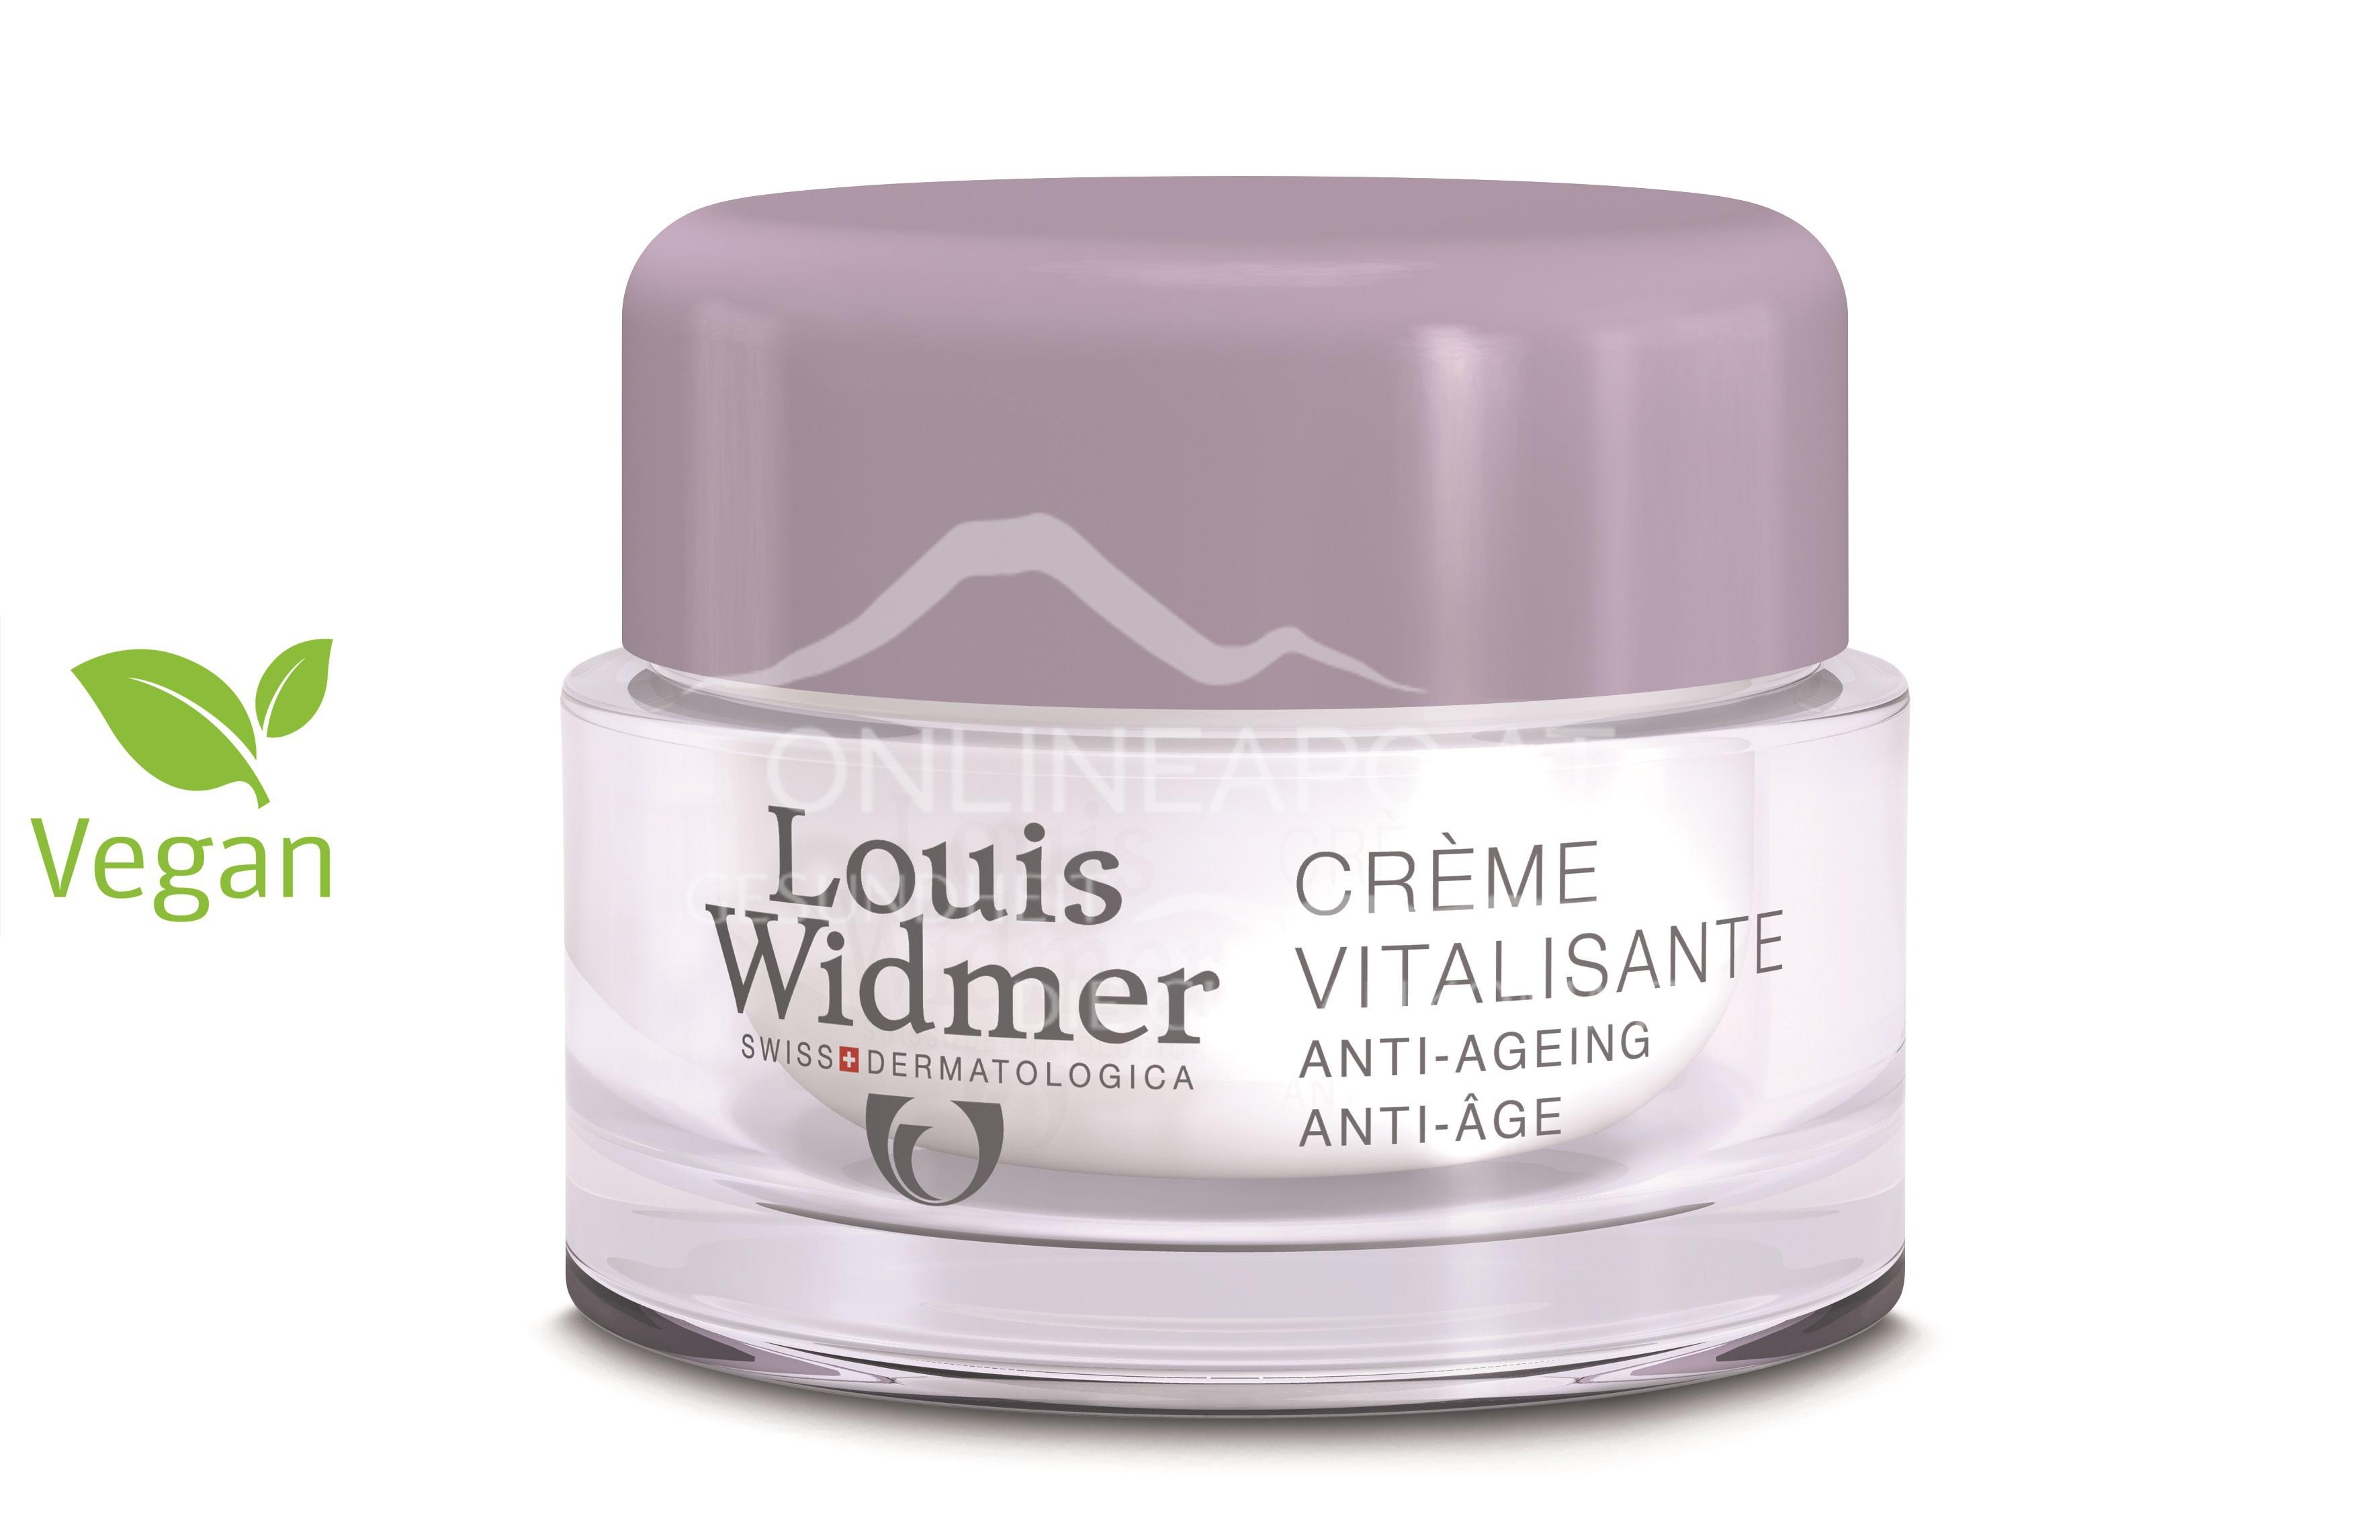 Louis Widmer Crème Vitalisante